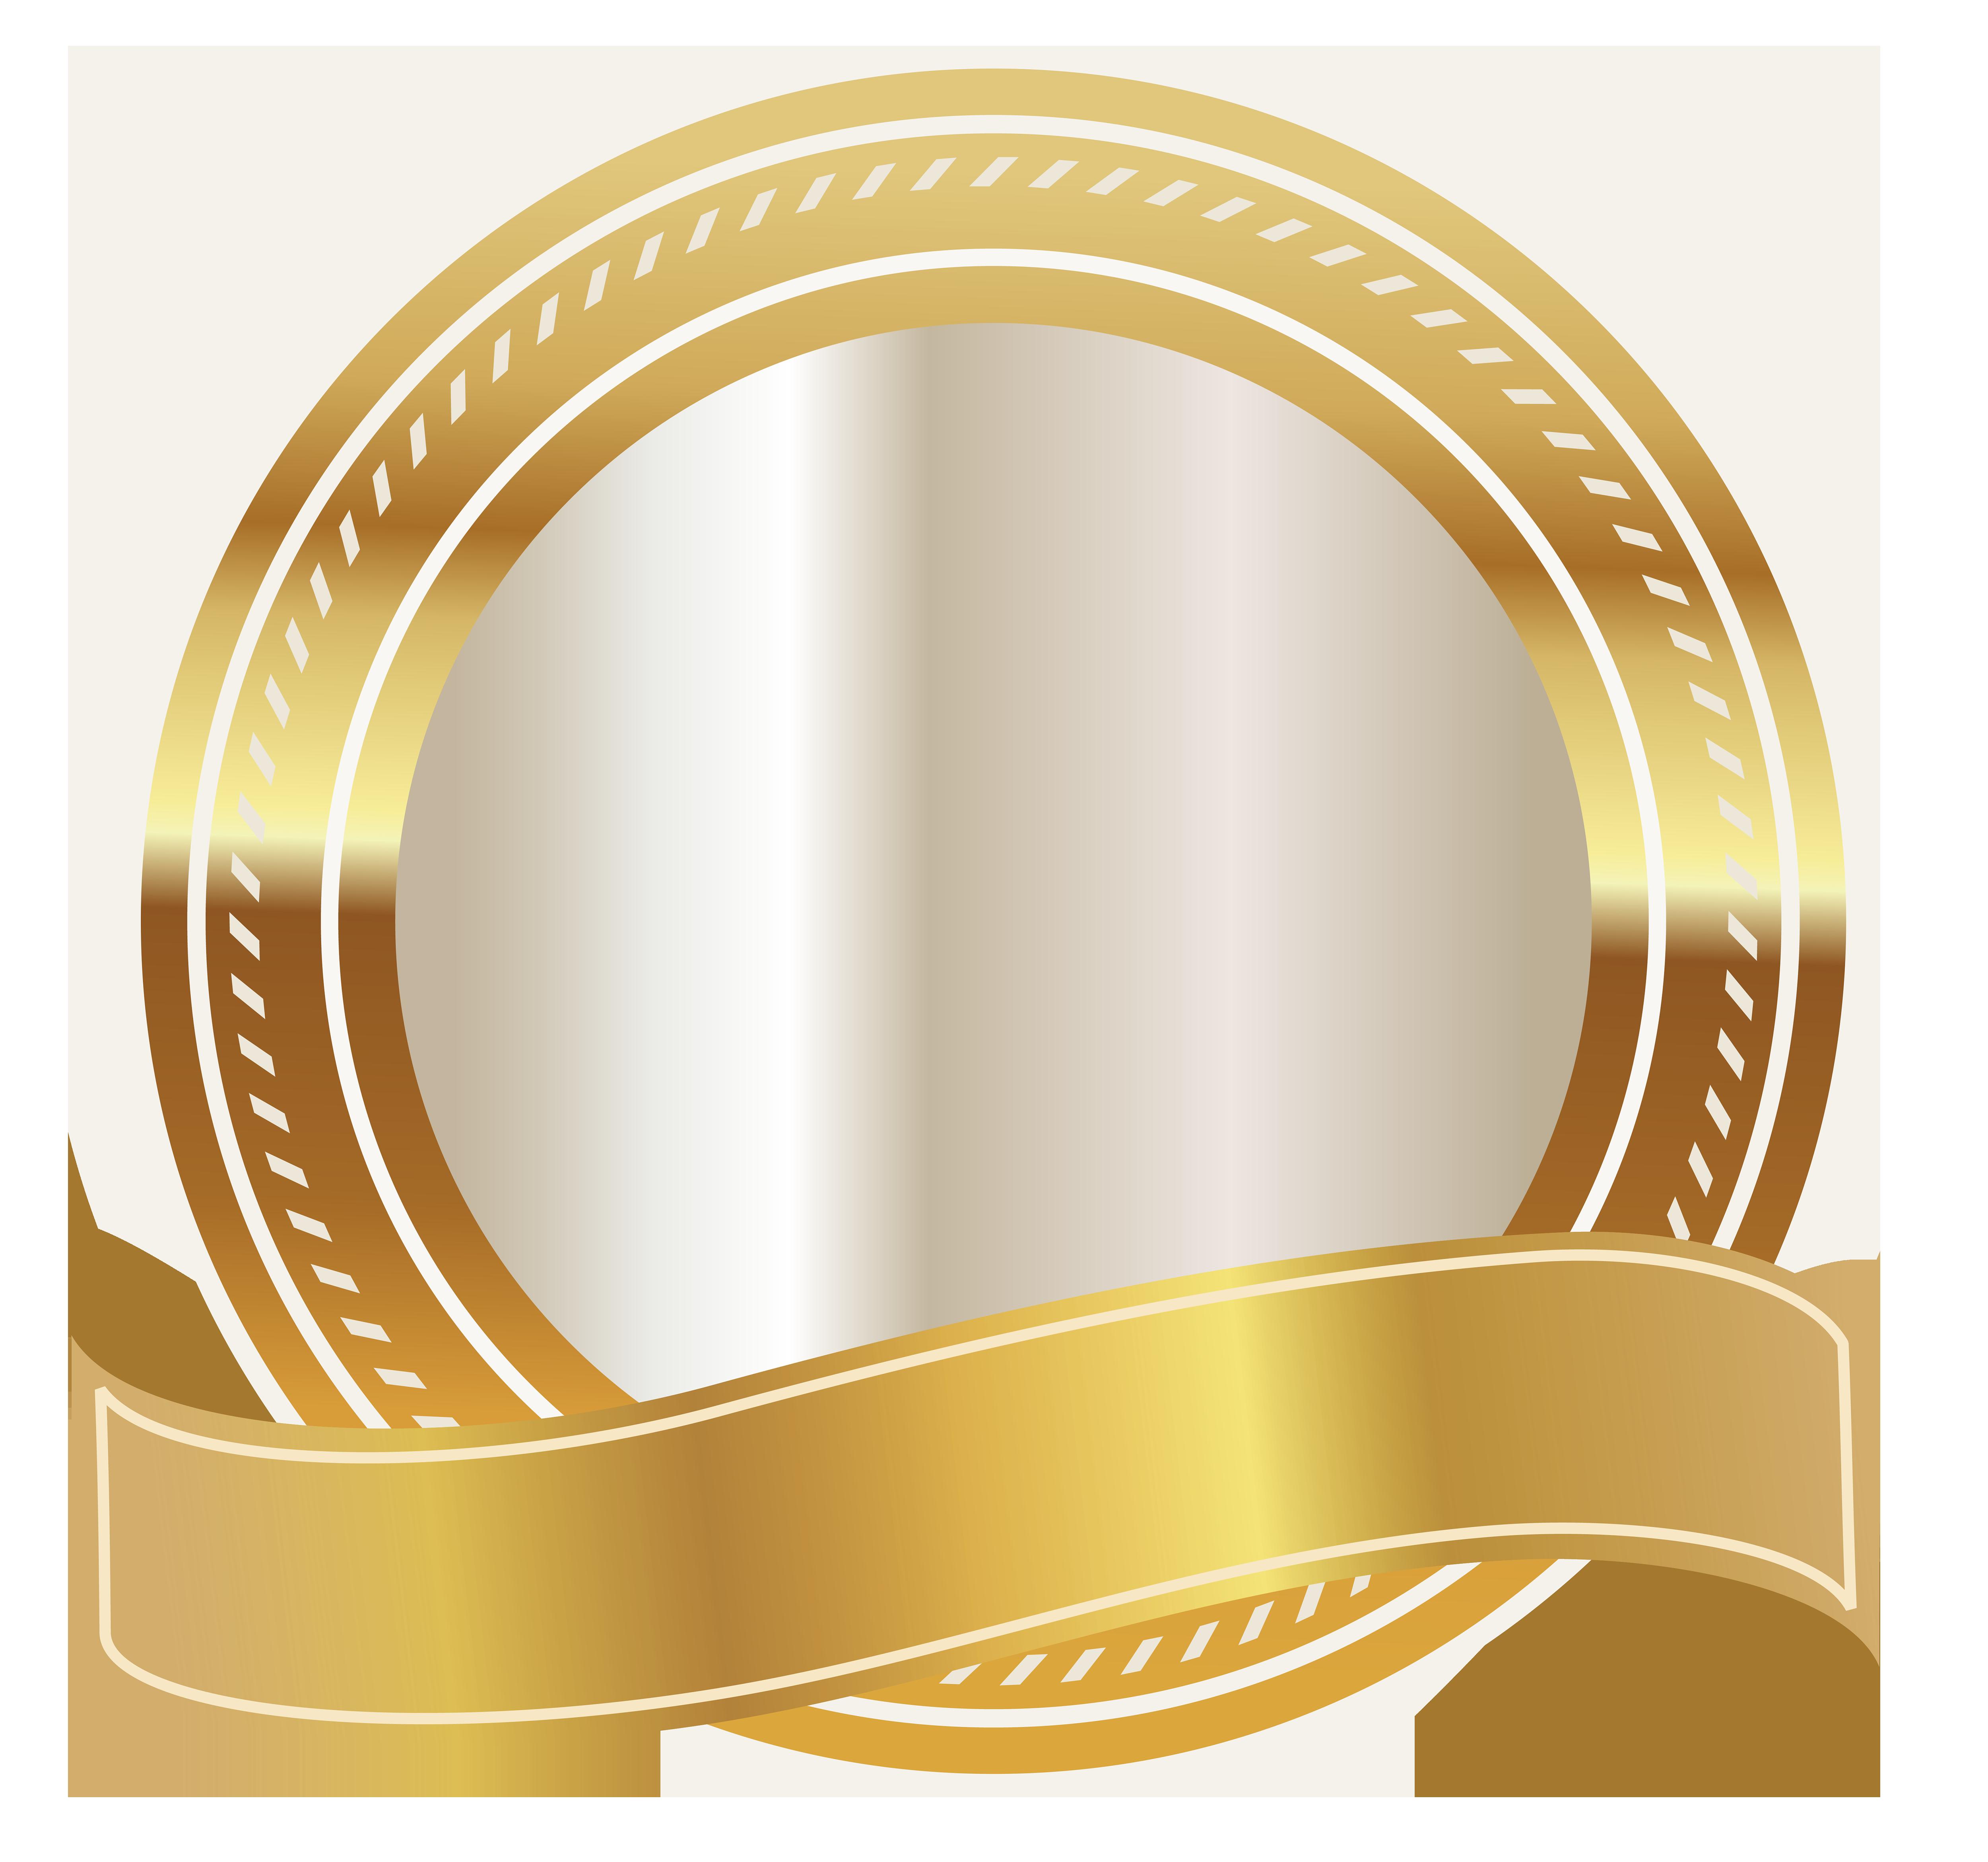 Gold Seal with Gold Ribbon PNG Clipart Image Molduras